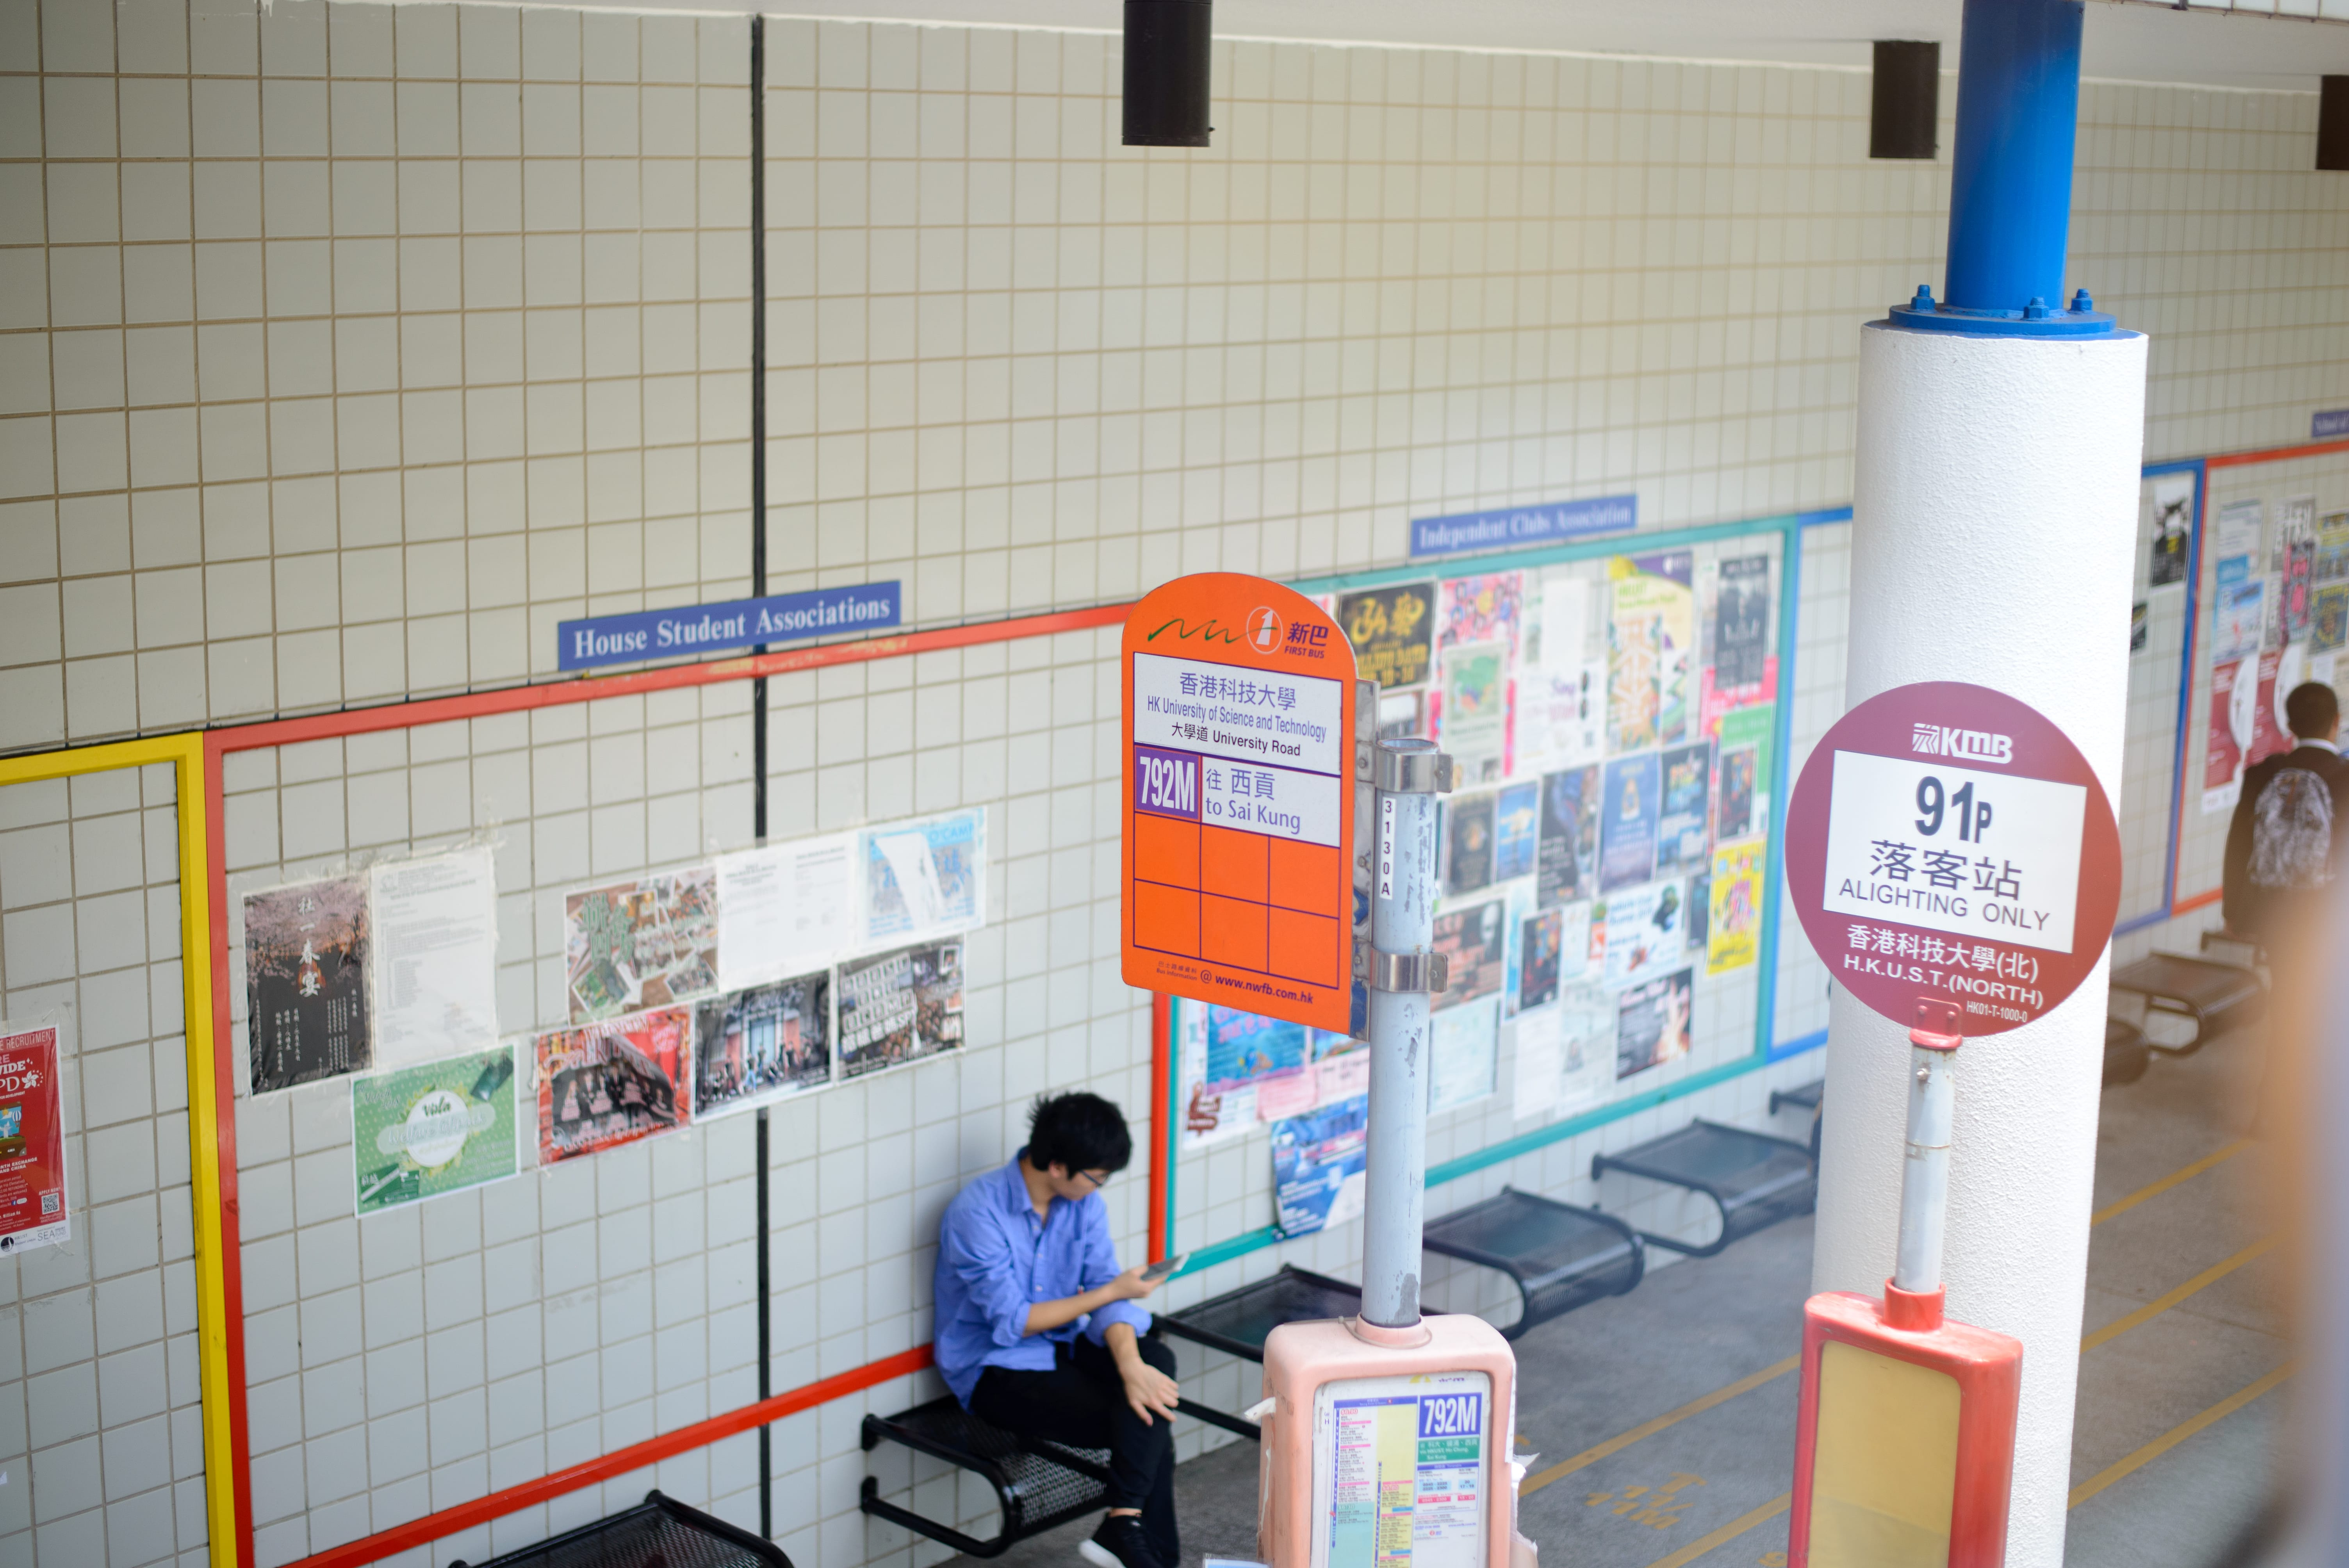 Bus Stop at Hong Kong University of Science and Technology